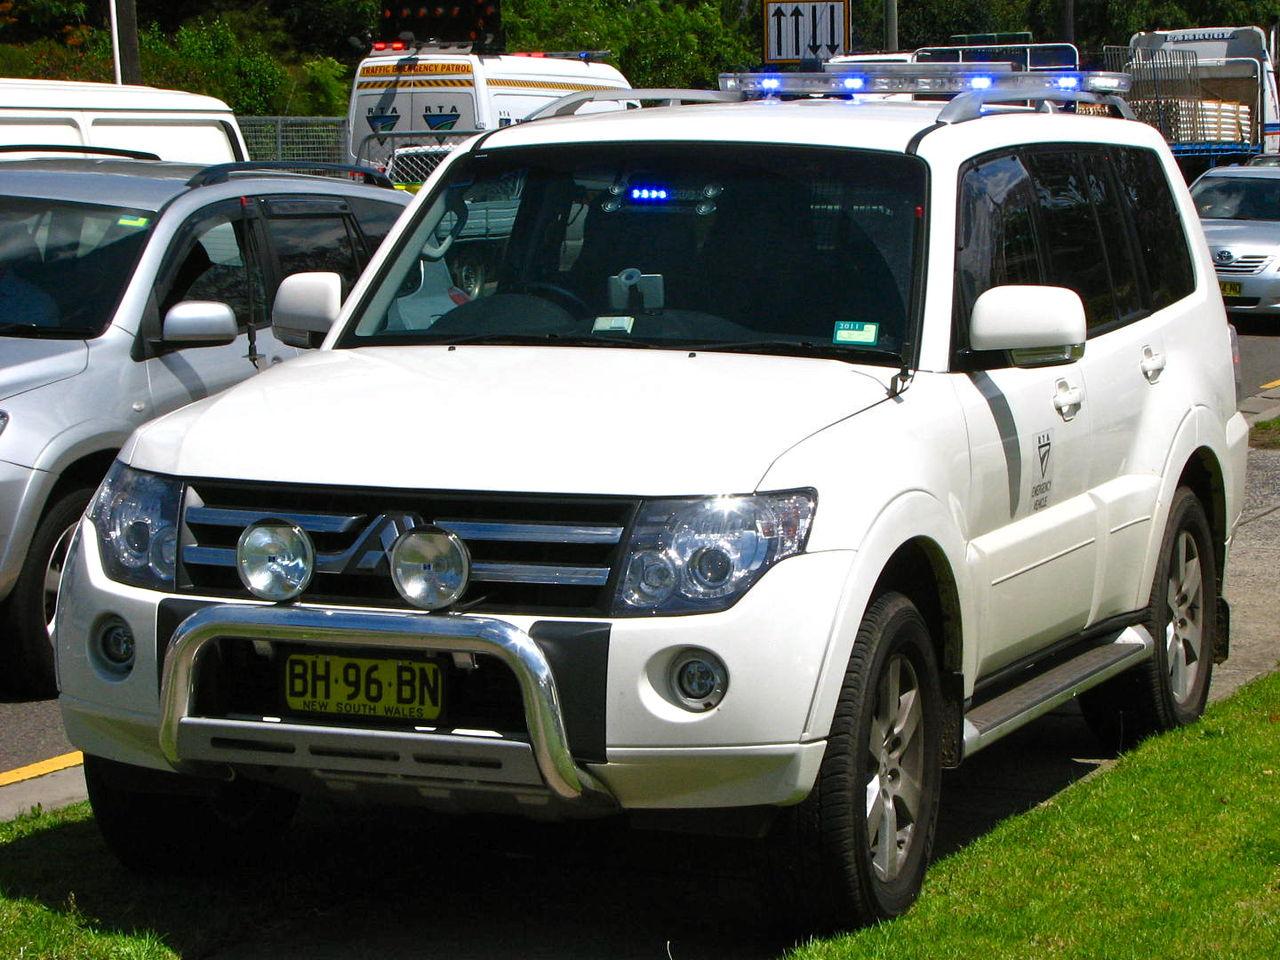 File:Mitsubishi Pajero RTA Traffic Commander - Flickr